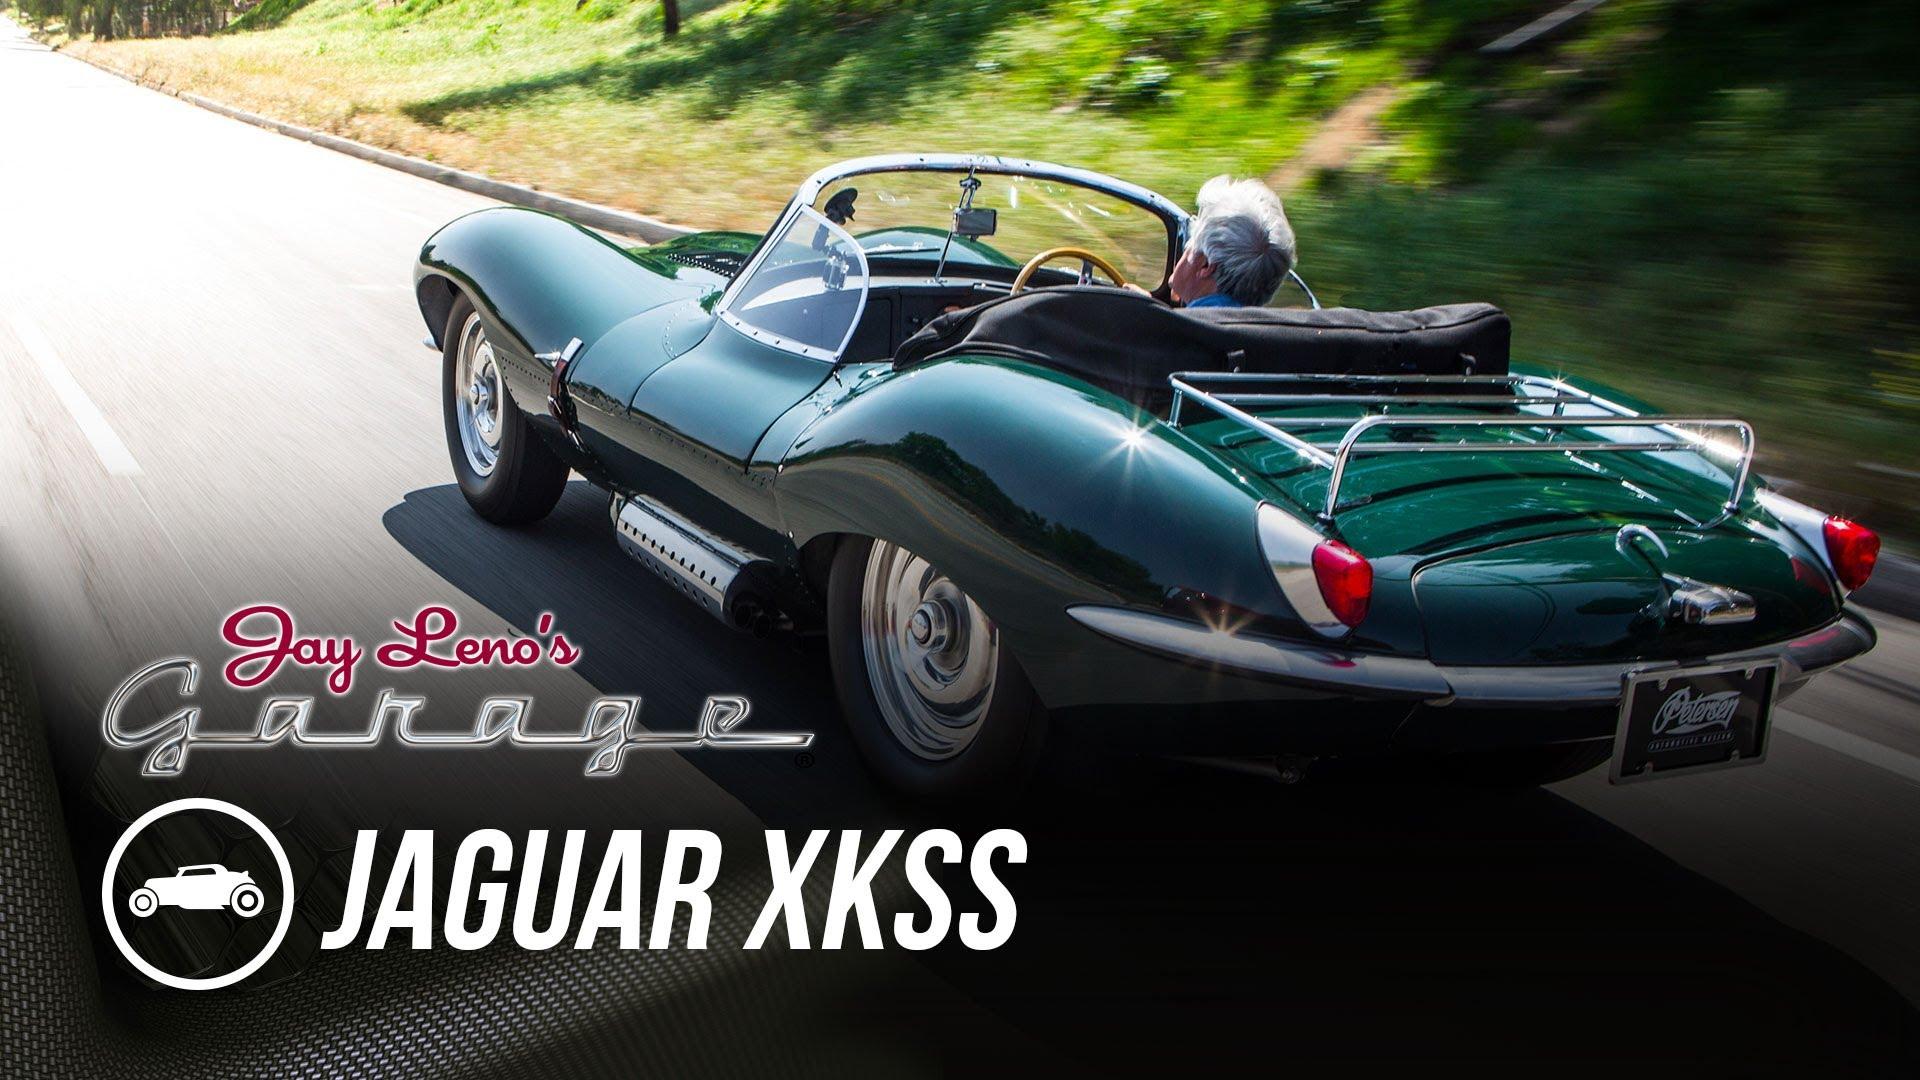 Jaguar brings the new XKSS to Jay Leno's Garage